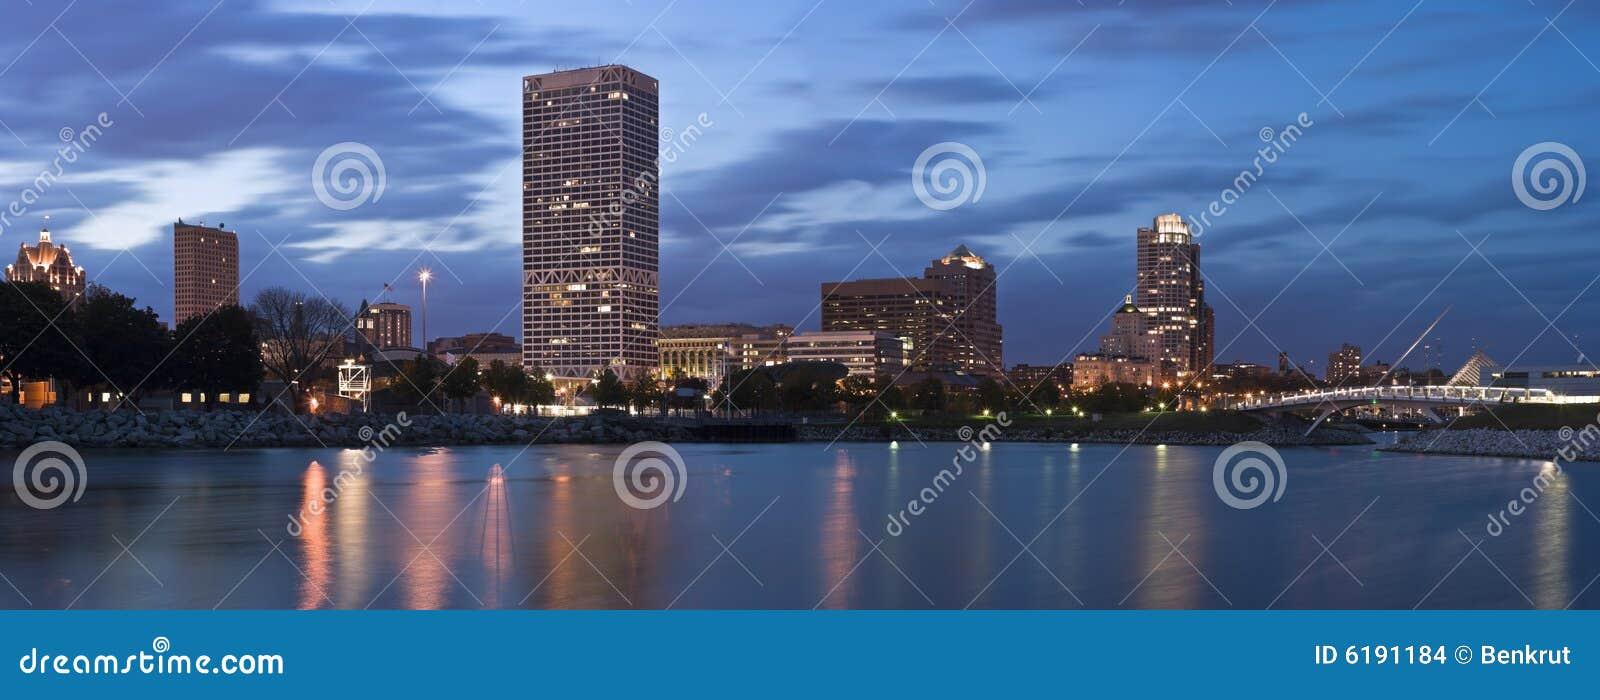 Panorama von Milwaukee - XXXL